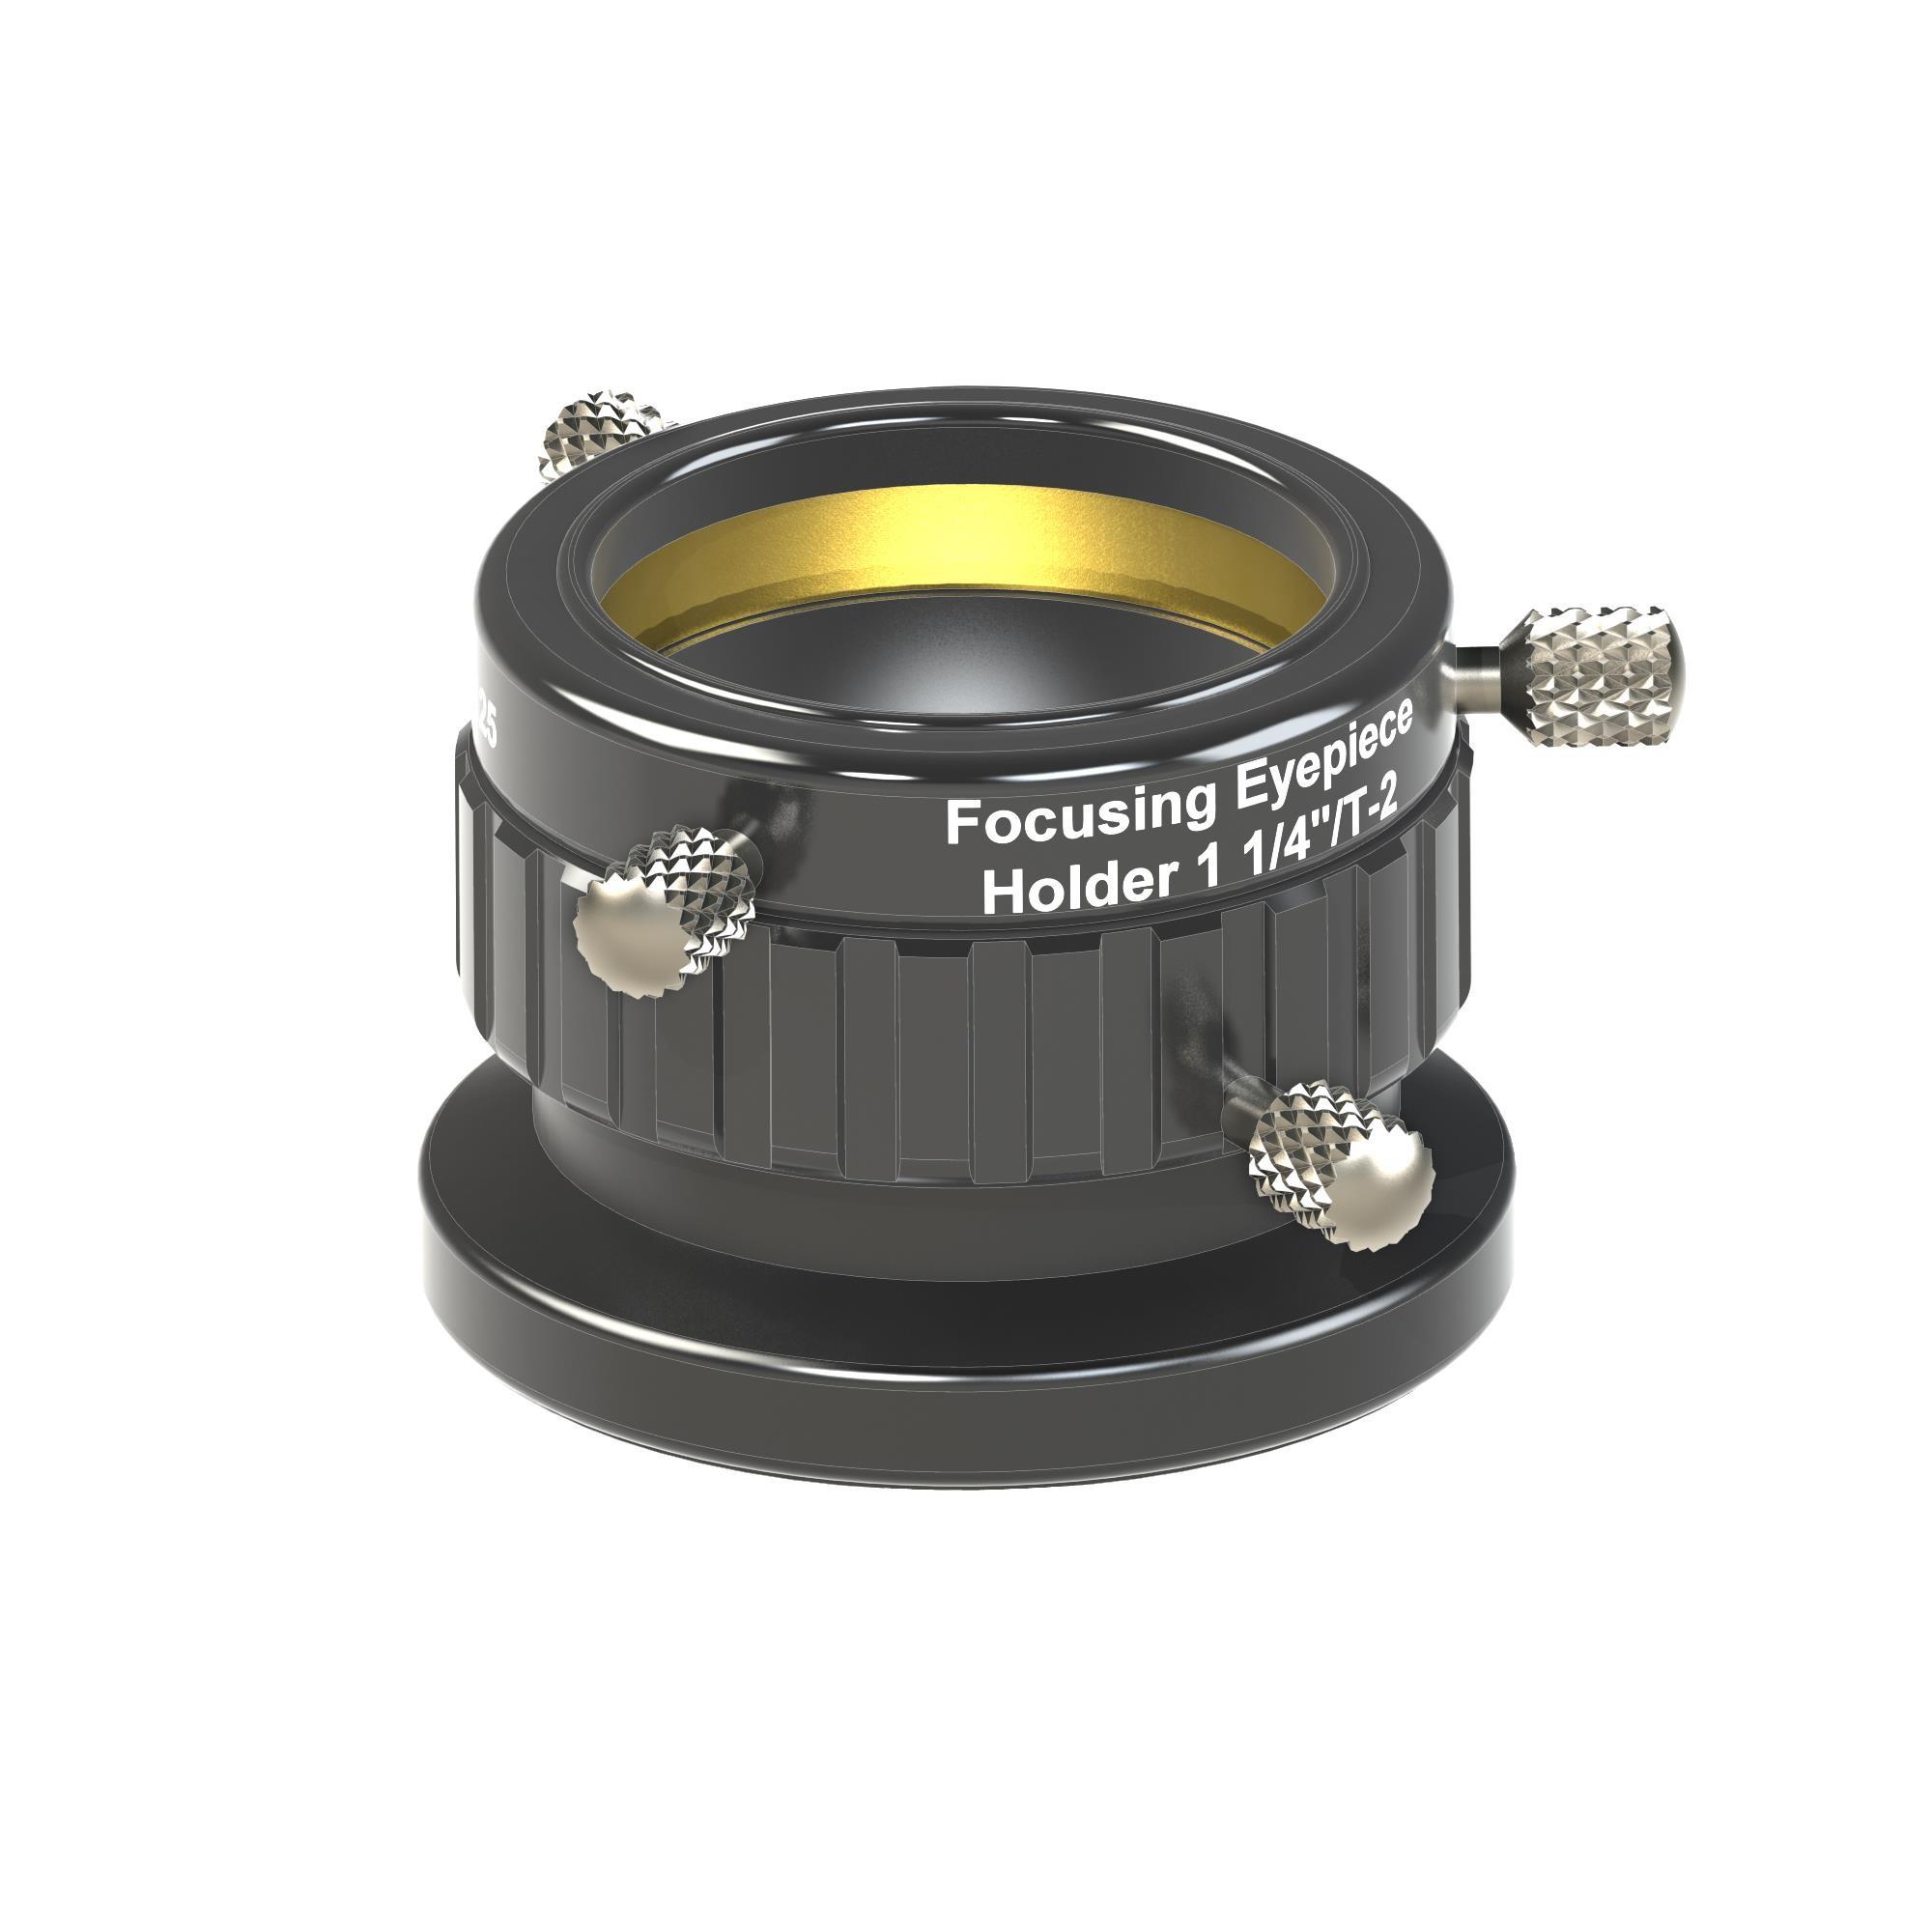 "Baader Focusing Eyepiece Holder 1¼"" / T-2  (T-2 part #08A)"